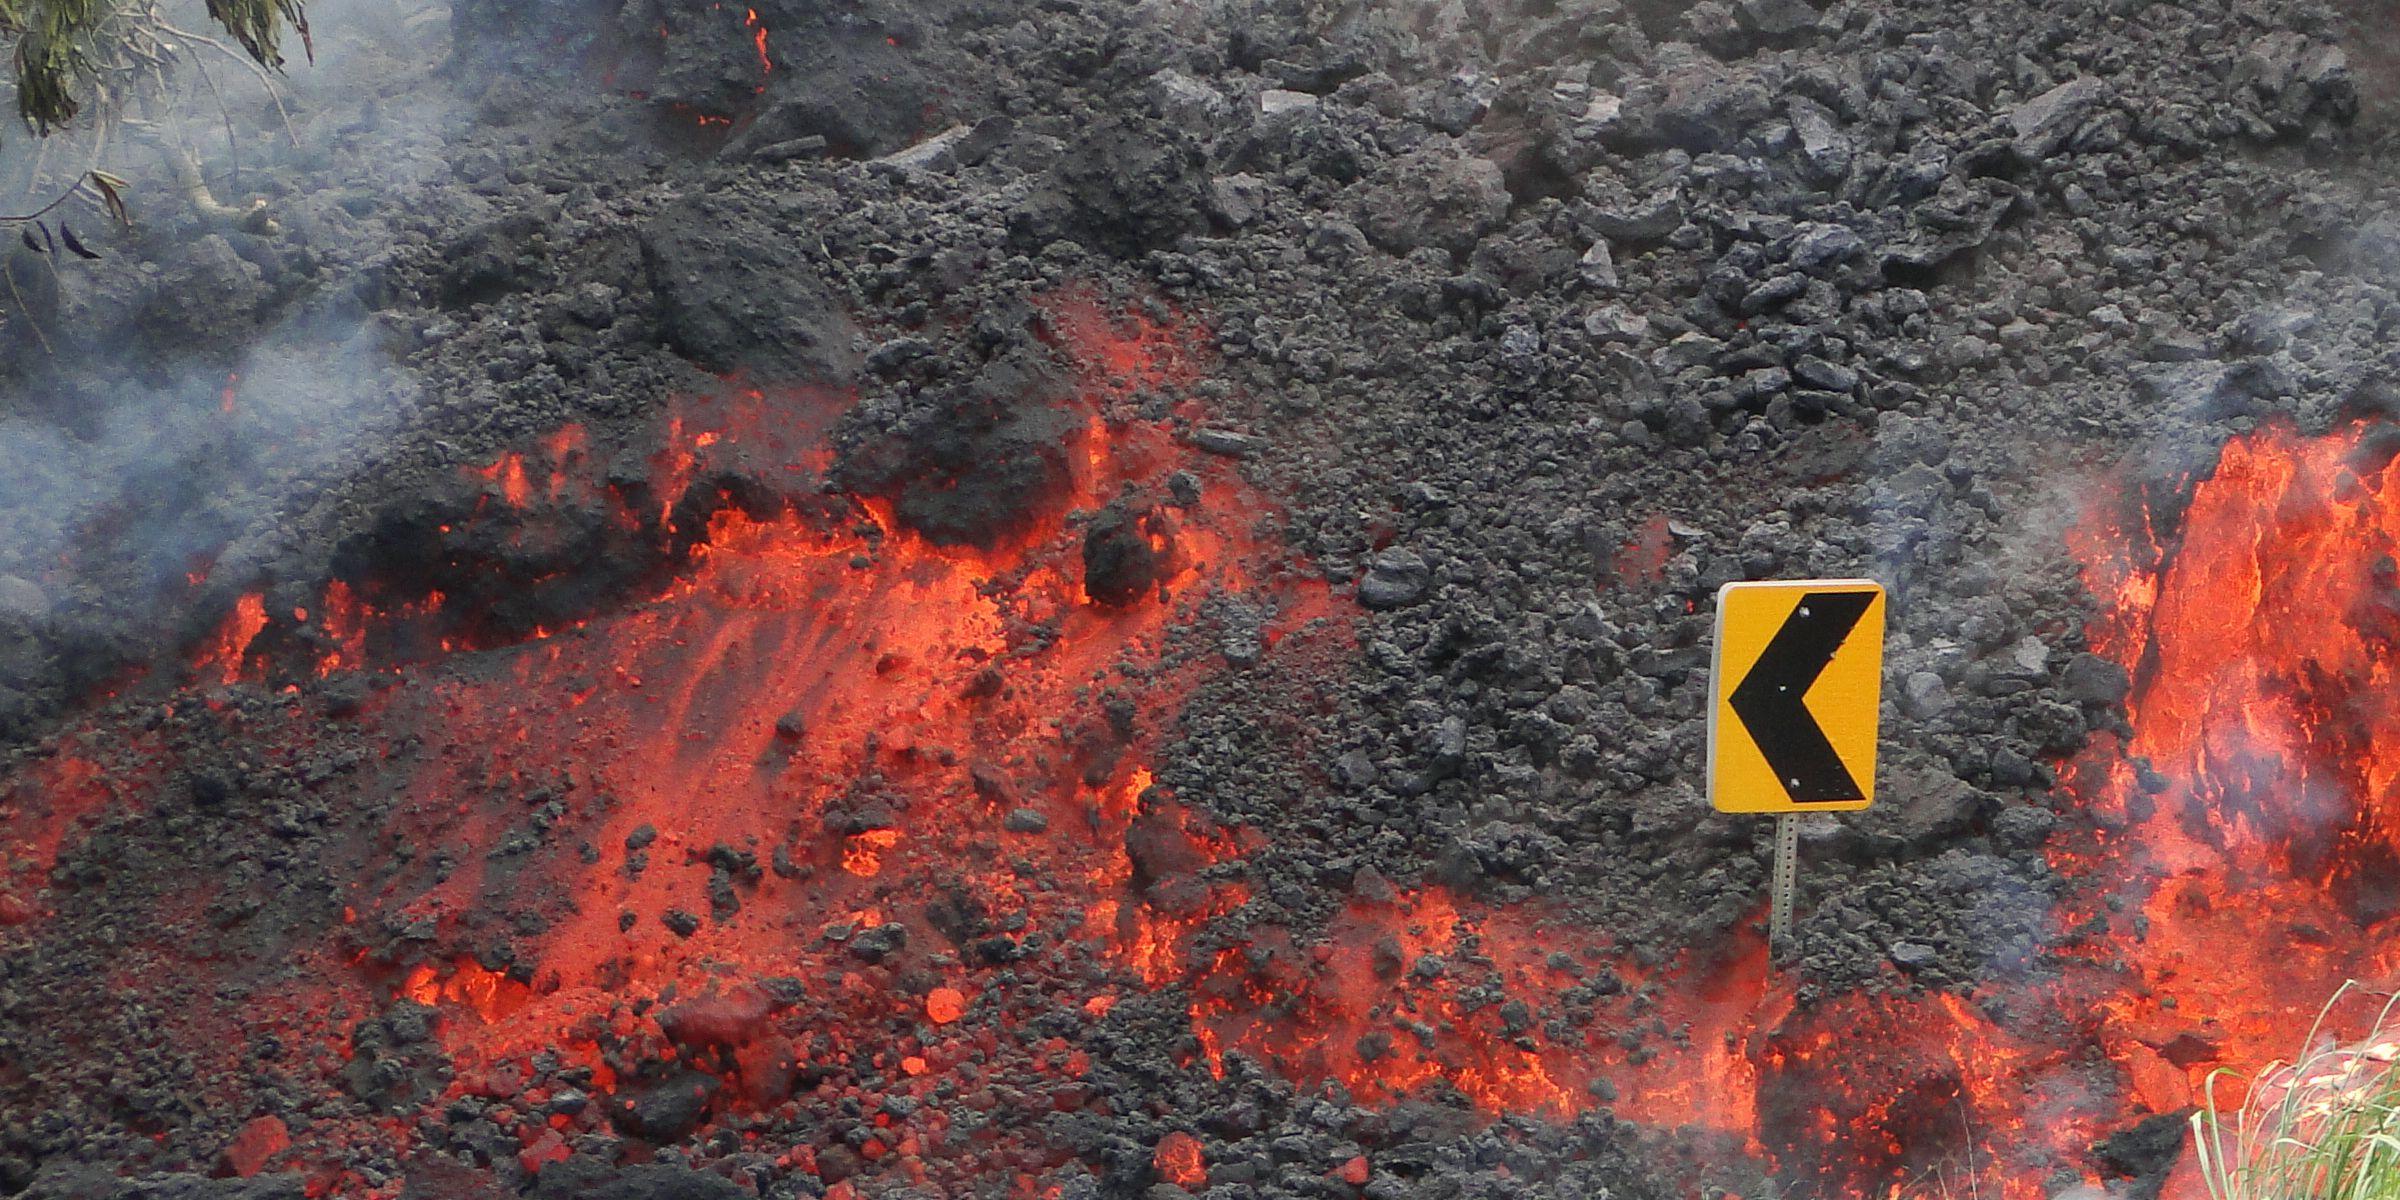 Threat level at Kilauea lowered again, signaling the end of an eruptive era